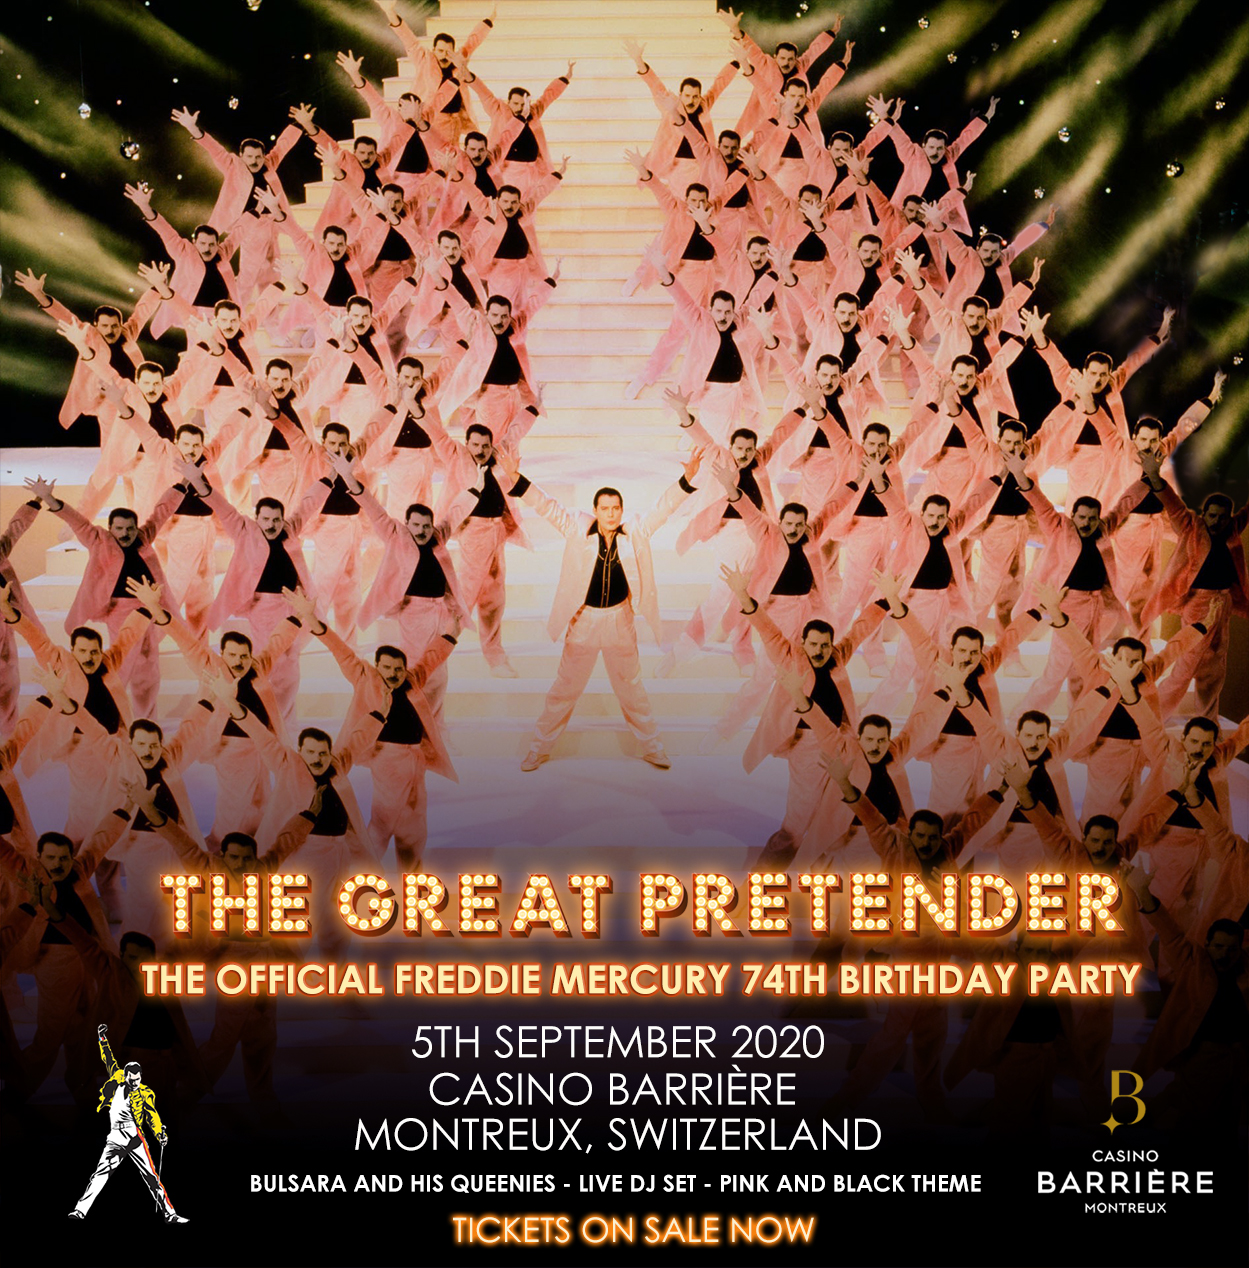 Fiesta Cumpleaños Freddie Mercury Montreux 2020